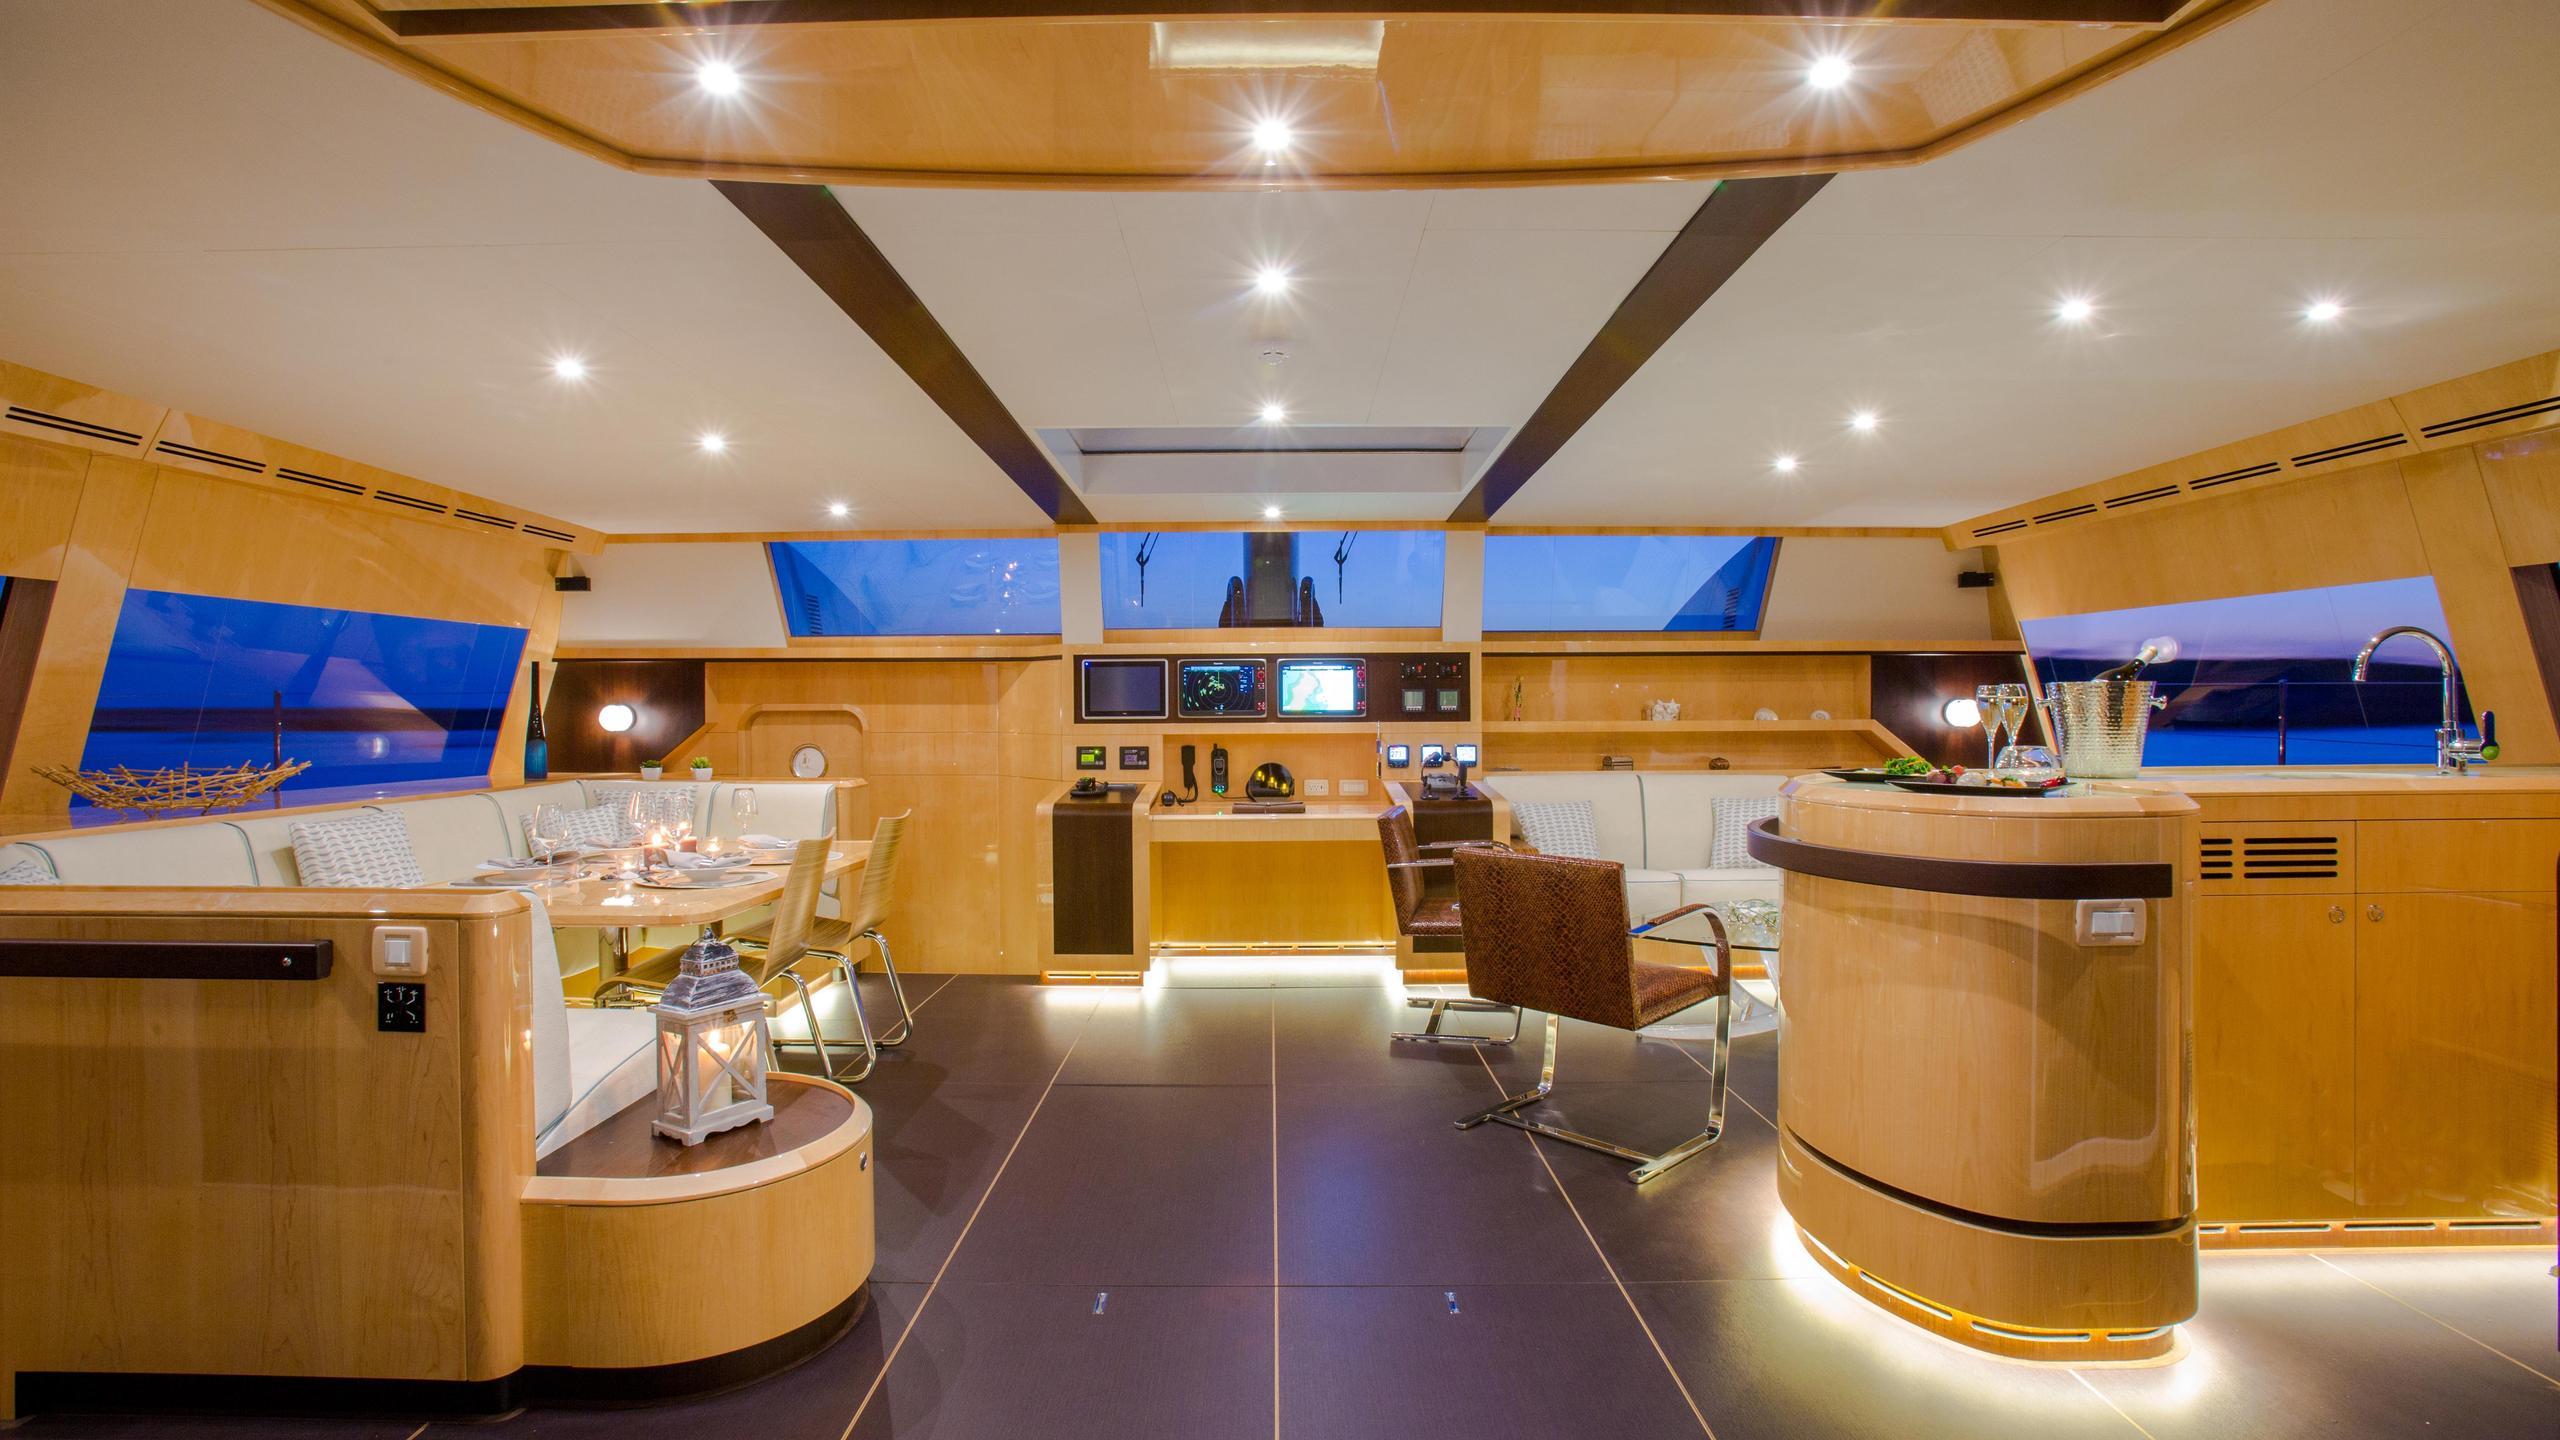 Windquest-catamaran-yacht-jfa-2014-26m-dining-room